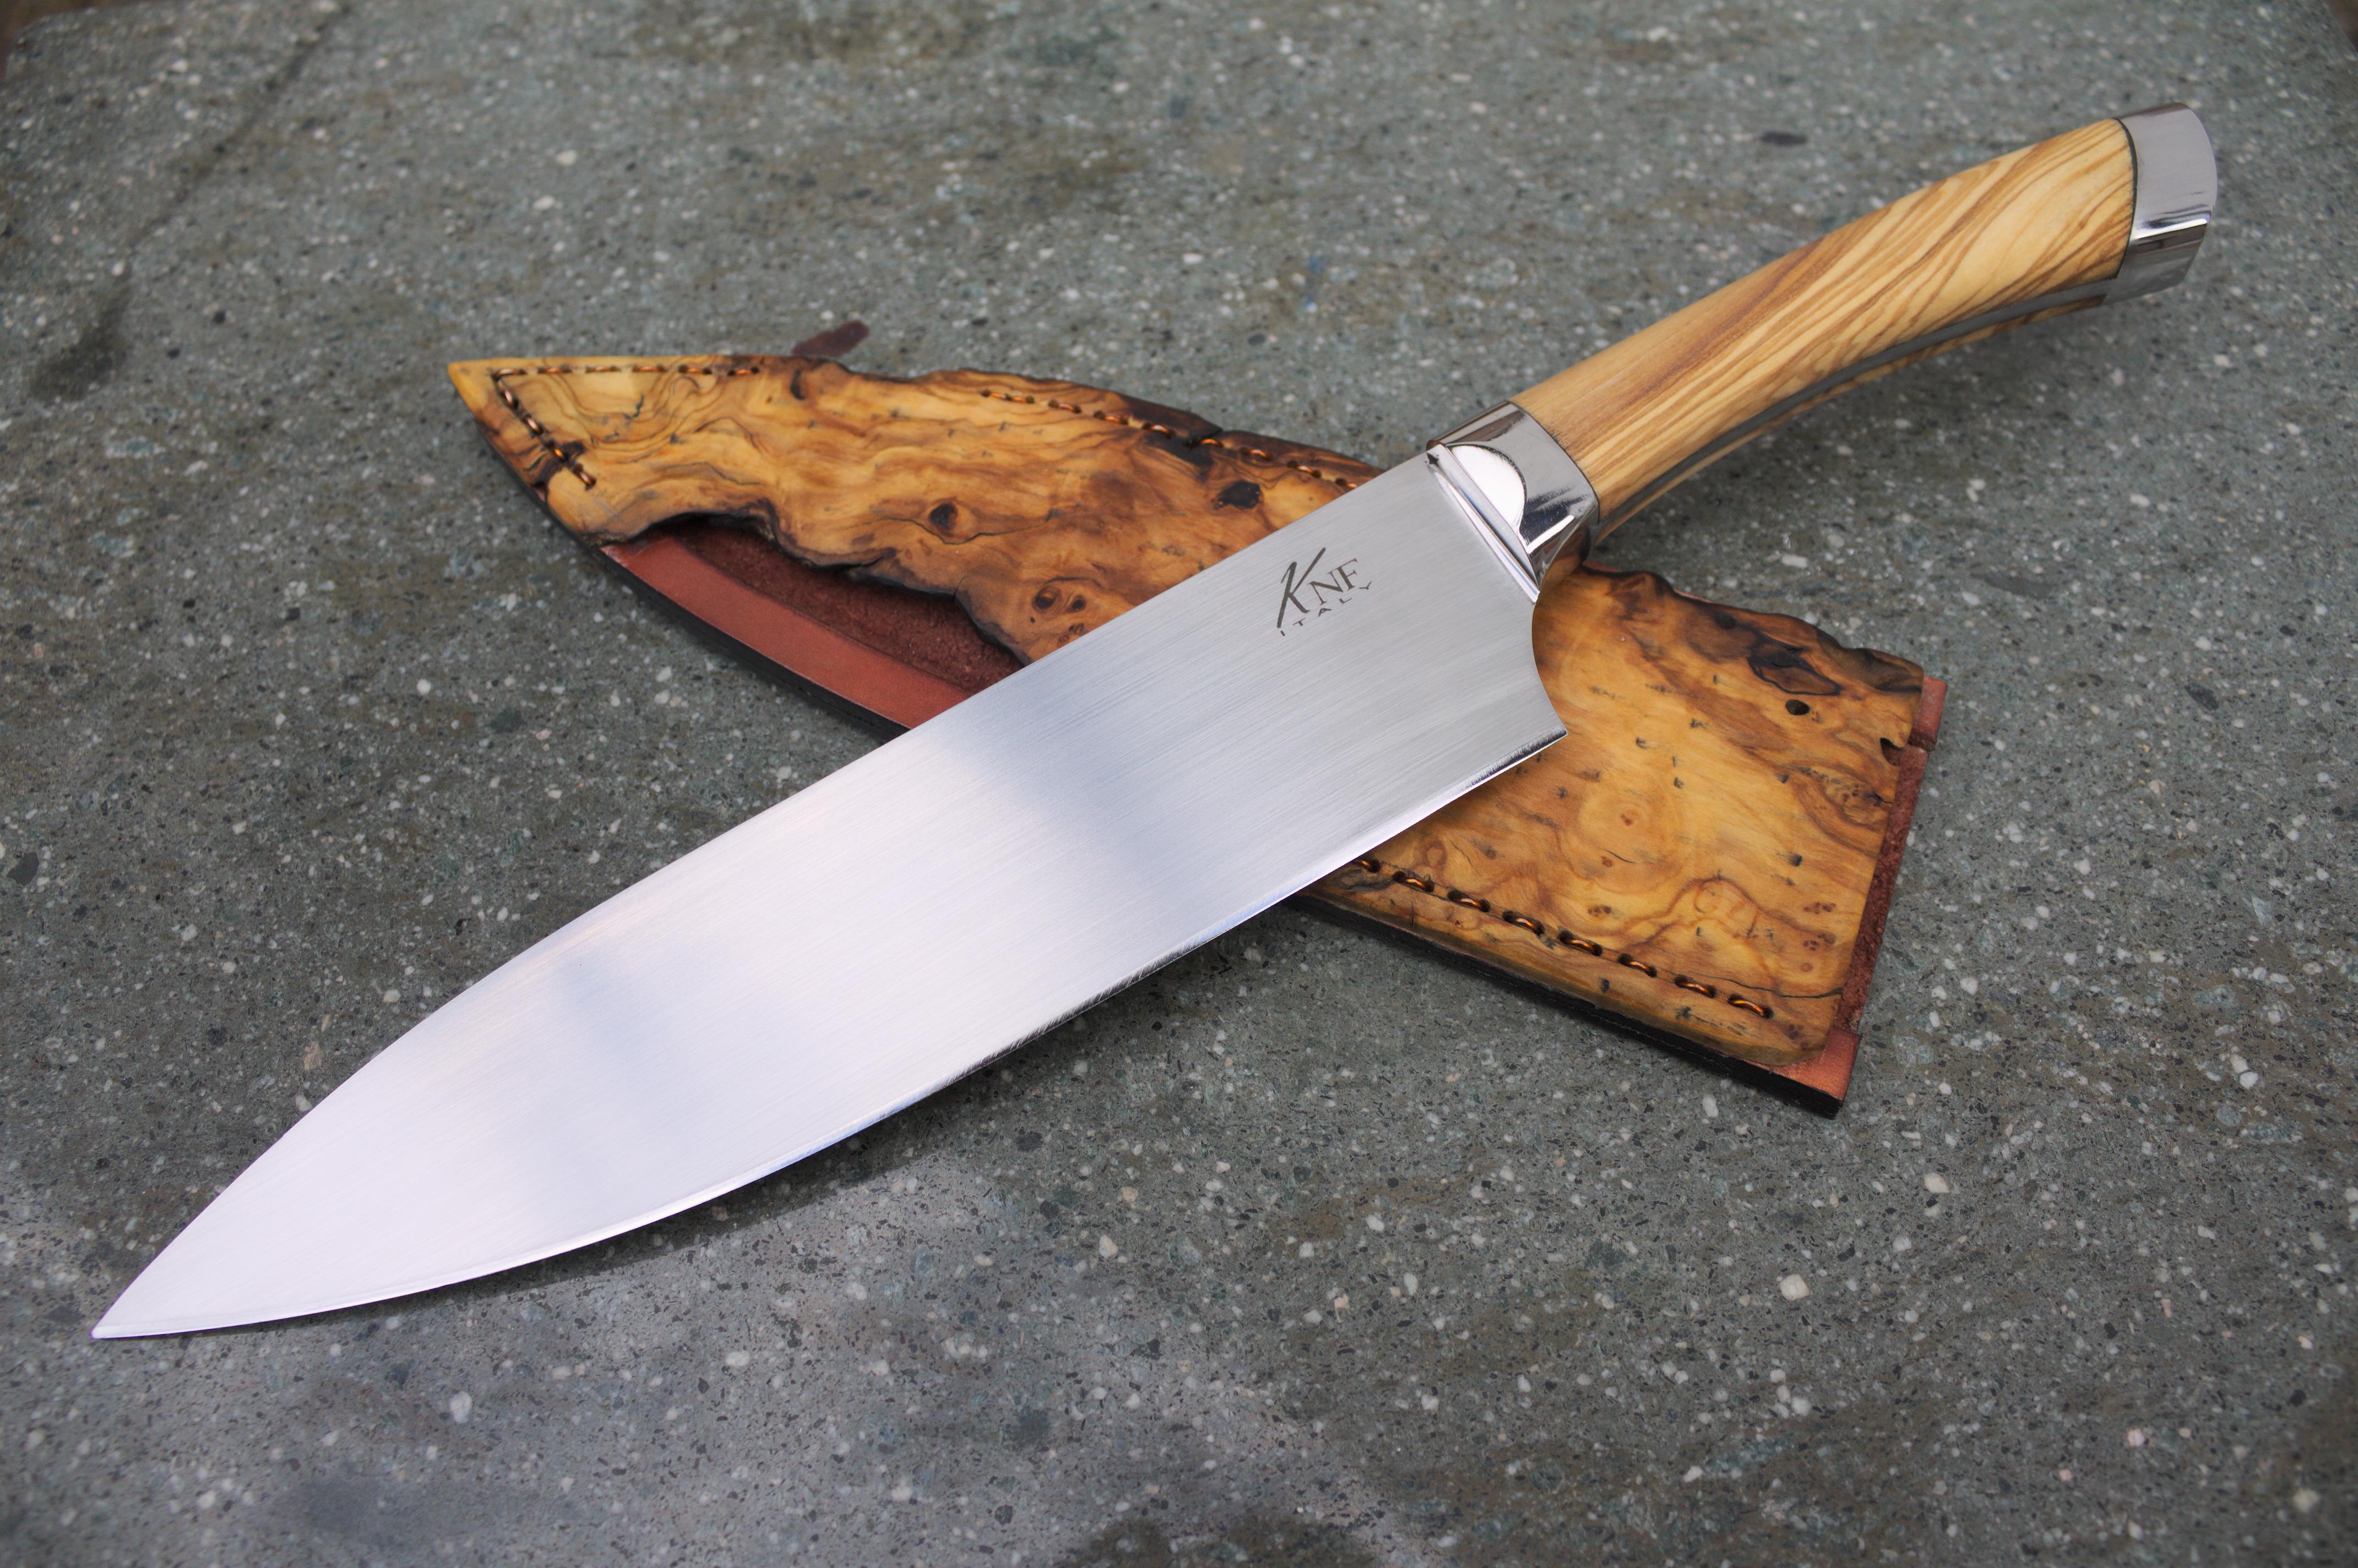 File:Handmade chef knife.jpg - Wikimedia Commons